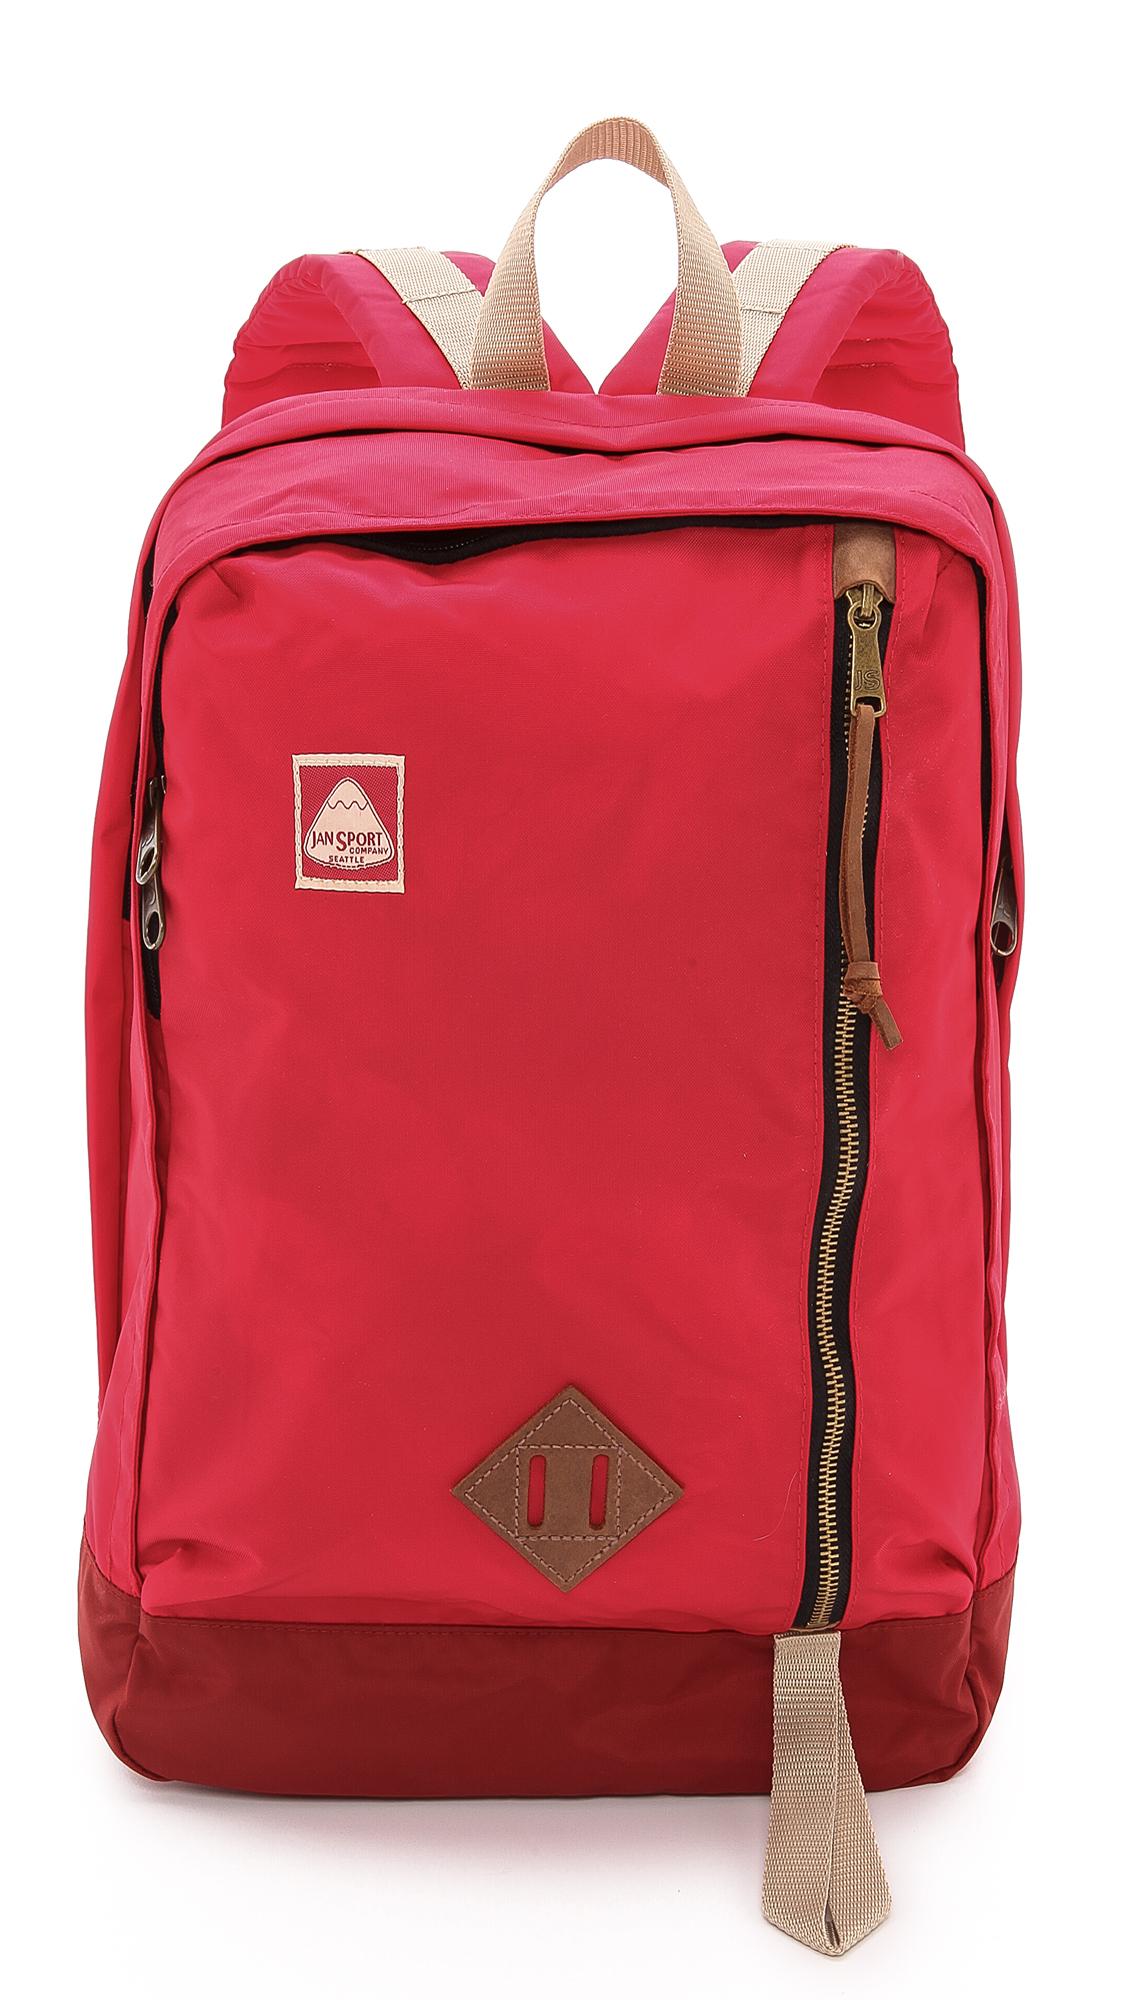 Where Jansport Backpacks Are Sold - Frog Backpack